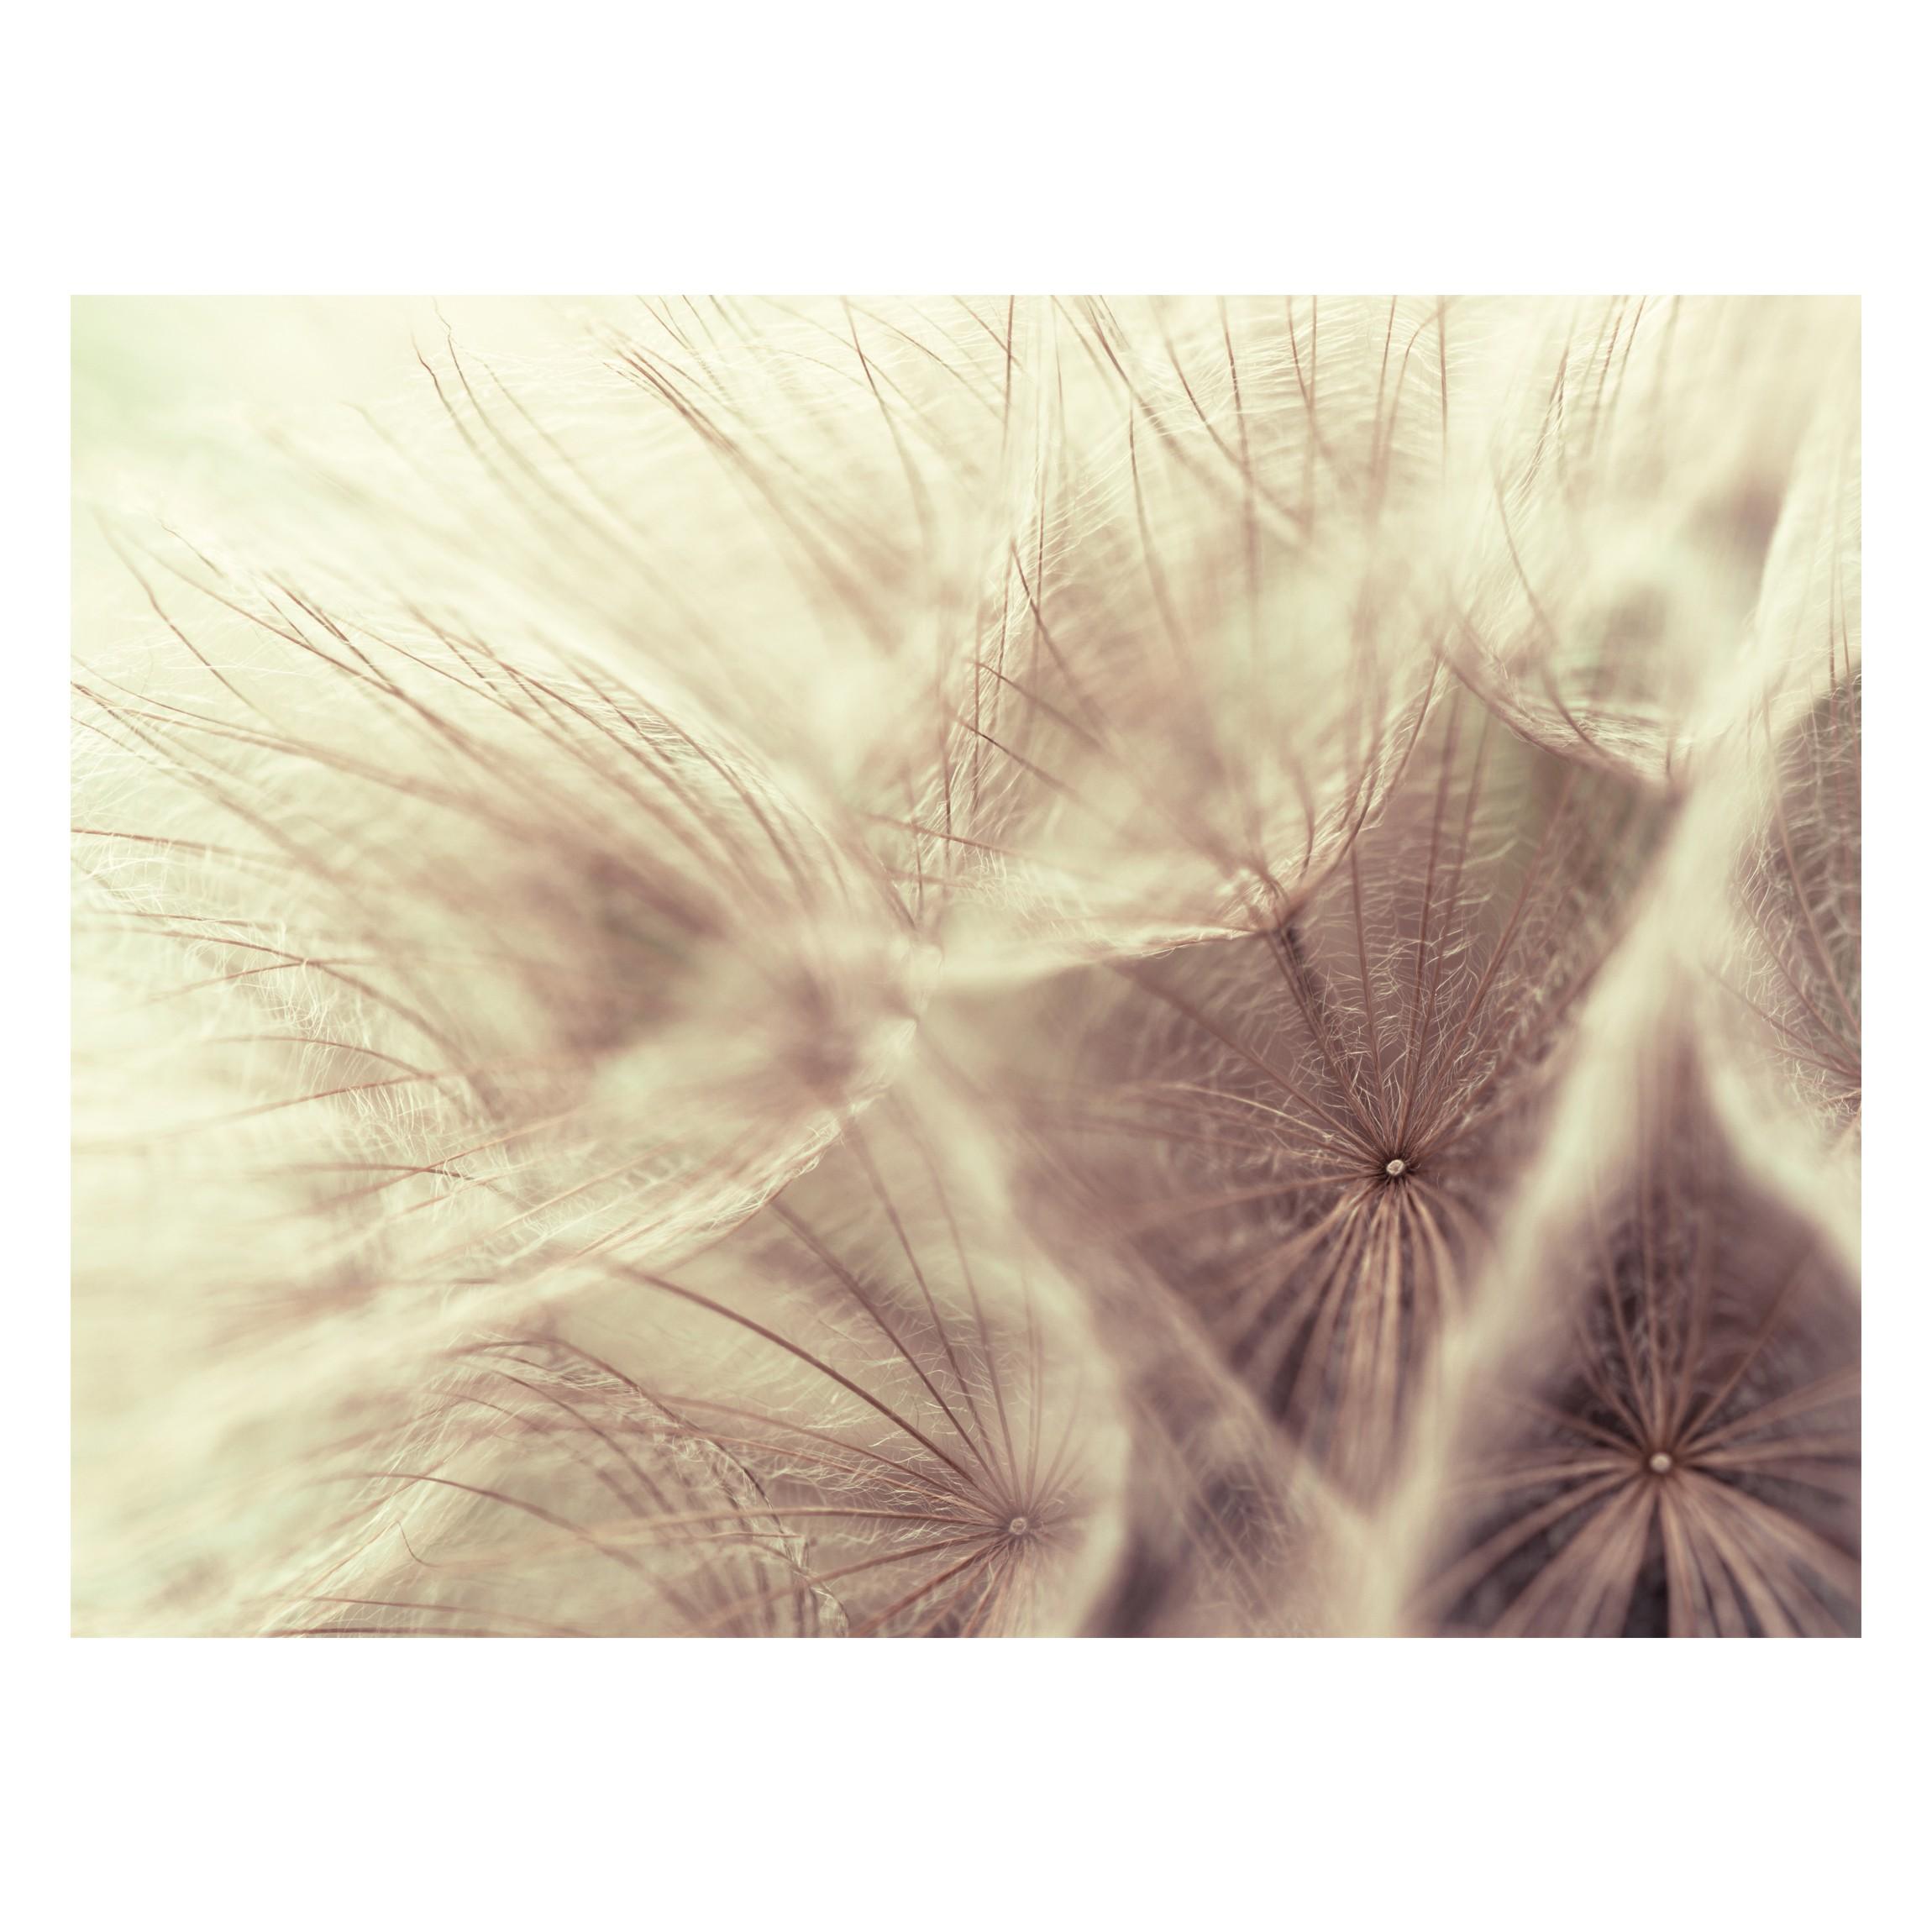 selbstklebende tapete detailreiche pusteblumen makroaufnahme mit vintage blur effekt. Black Bedroom Furniture Sets. Home Design Ideas